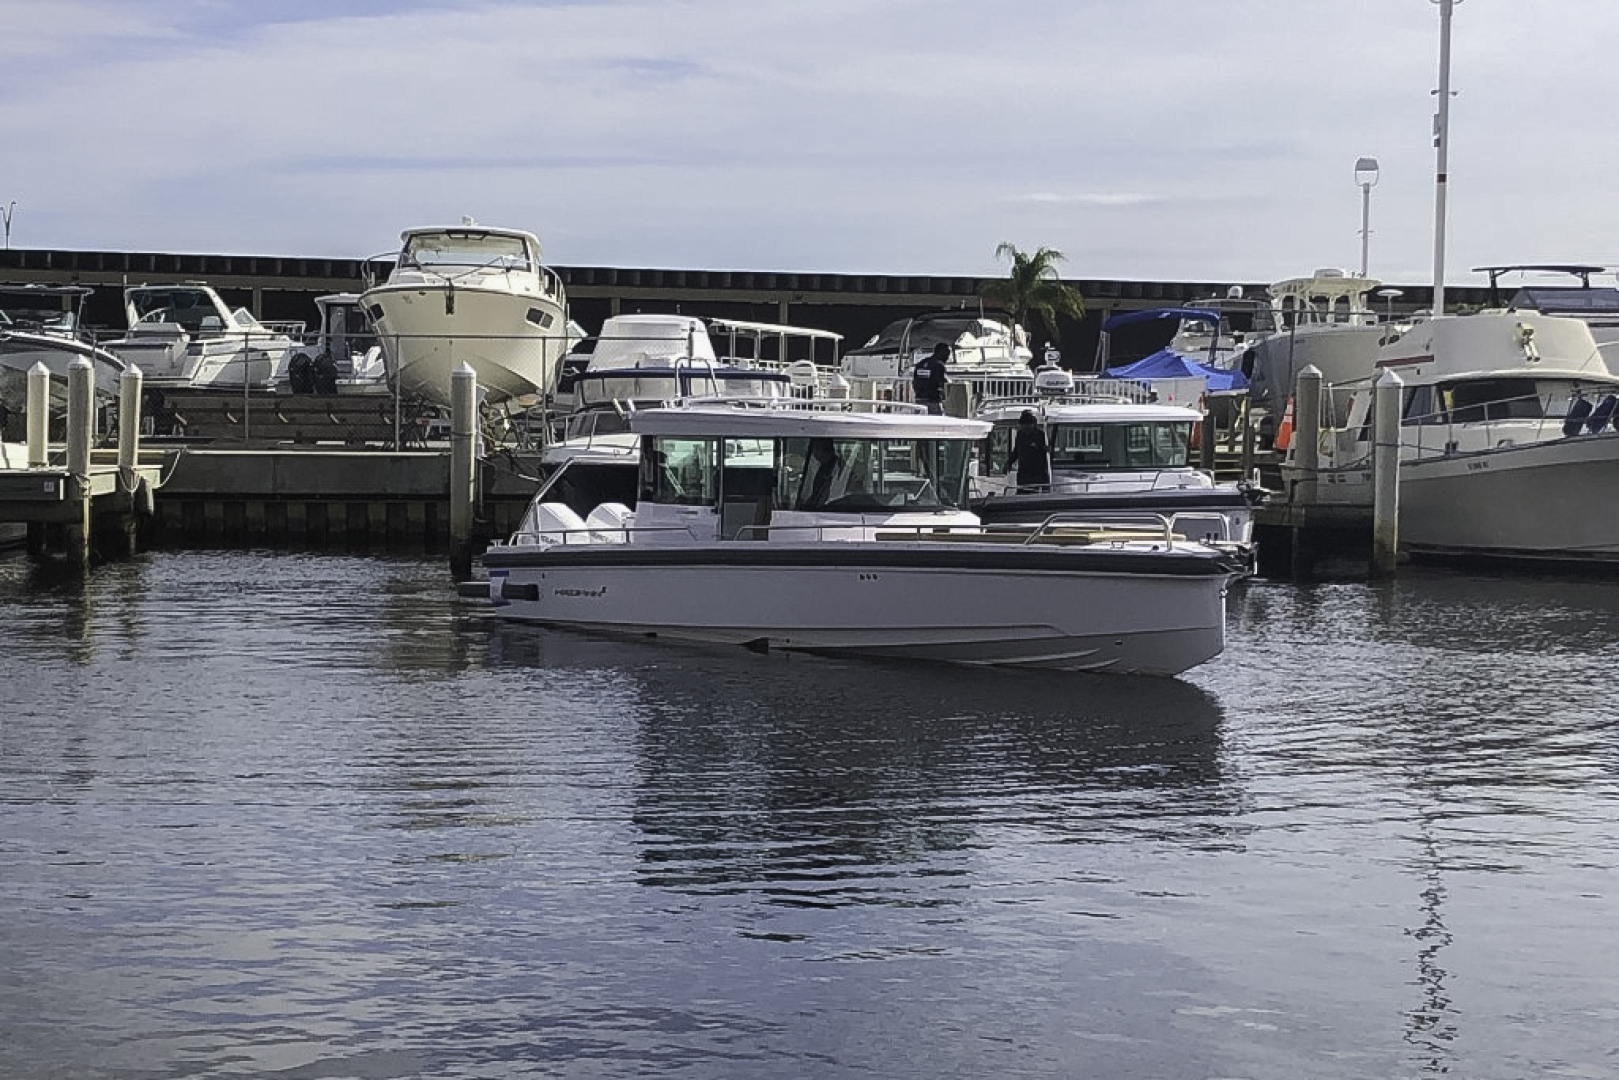 Axopar-28 CABIN 2020-Axopar 28 CABIN Fort Lauderdale-Florida-United States-1586679 | Thumbnail